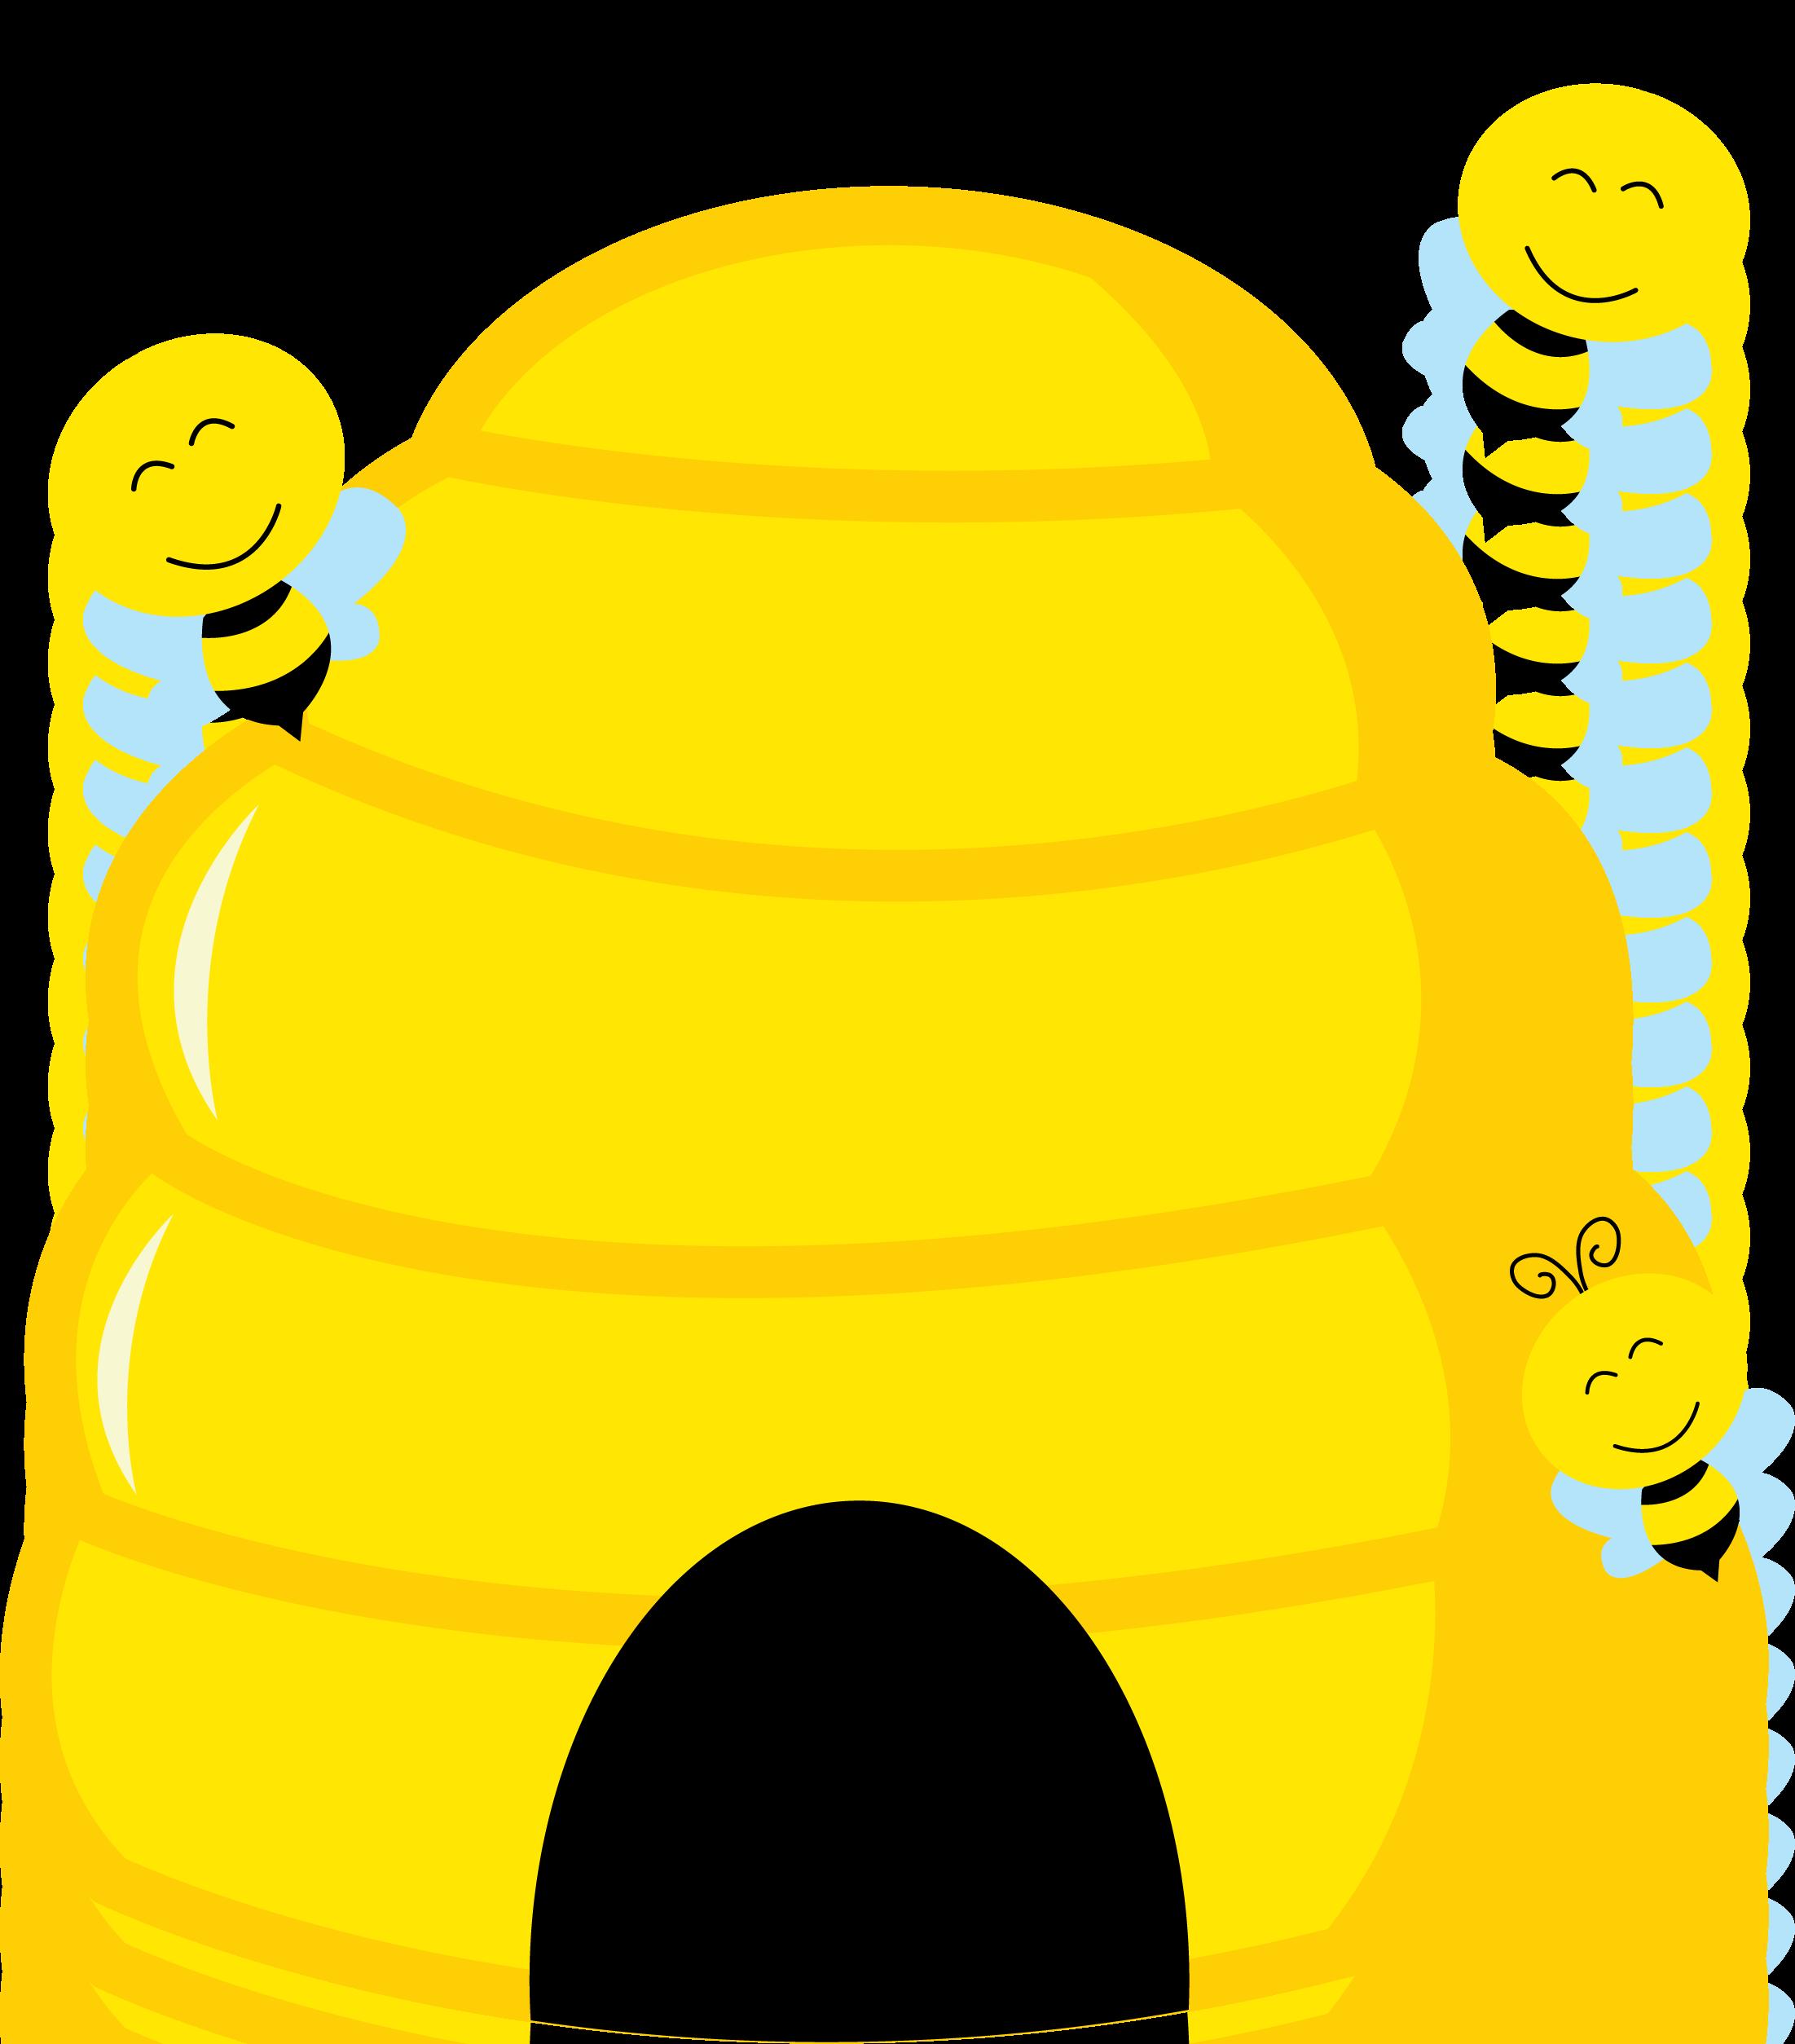 Bee clipart beehive. Imagens da abelhinha bees